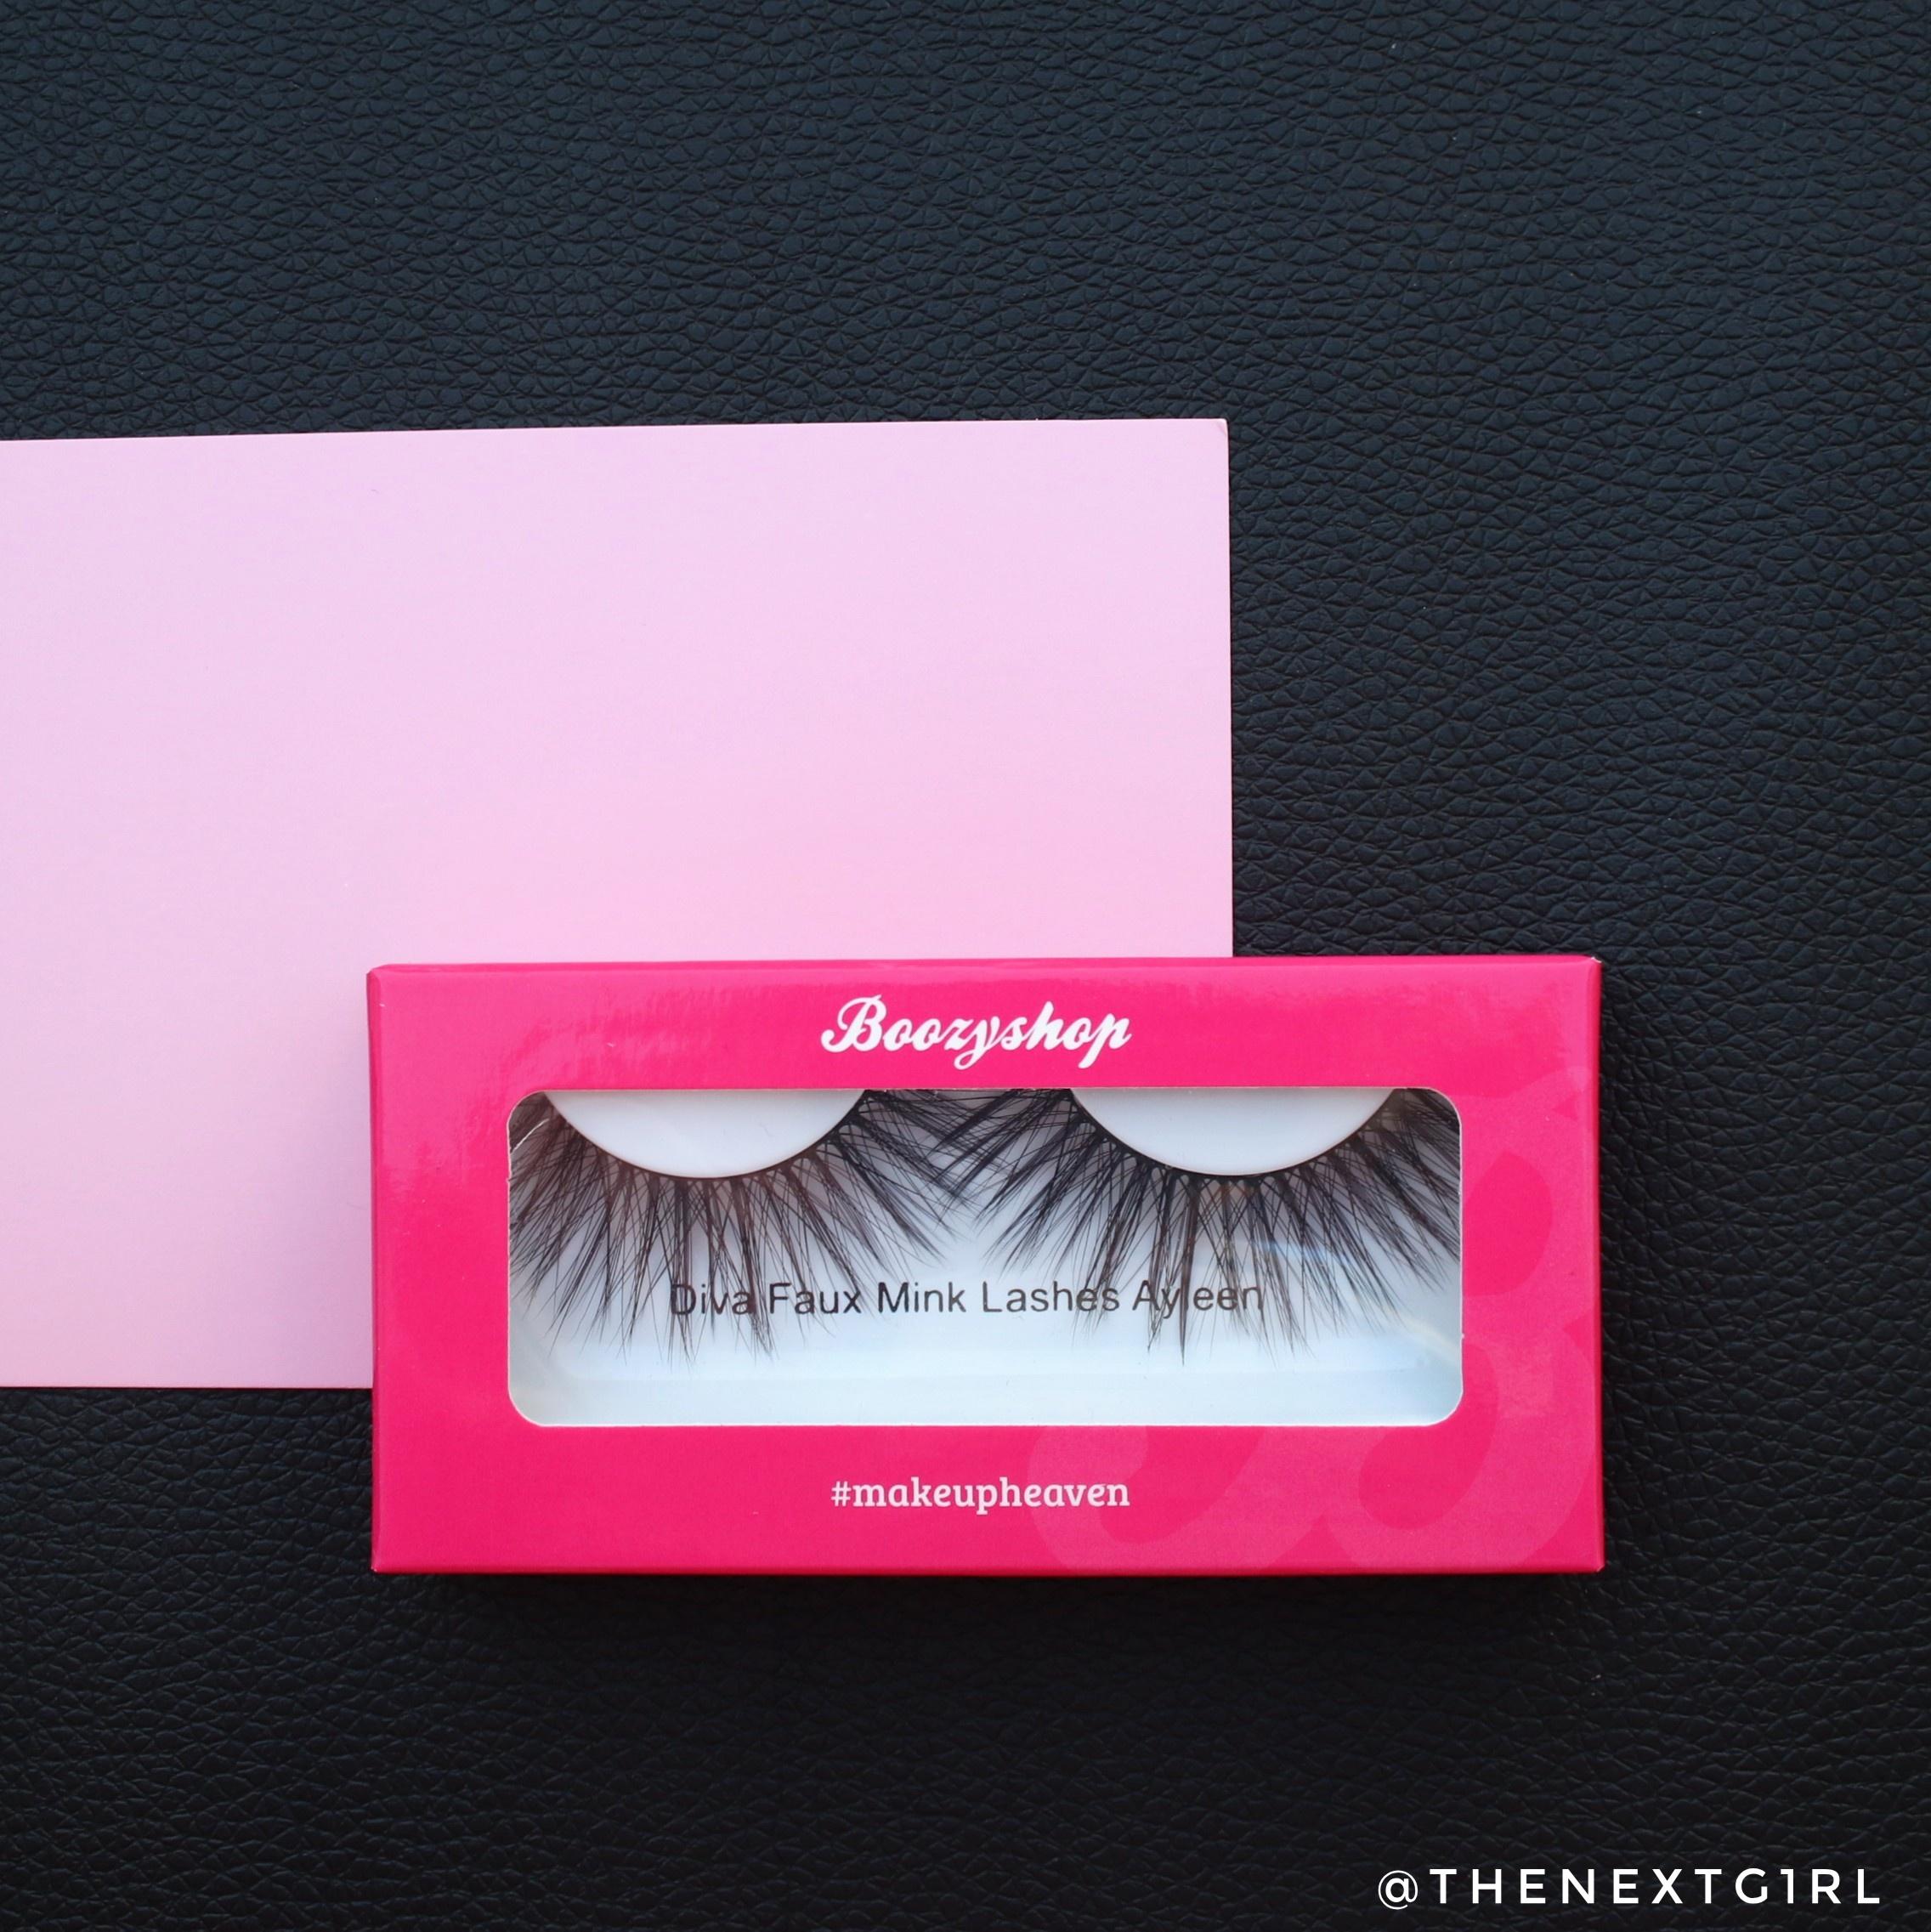 Boozyshop Diva lashes: Ayleen